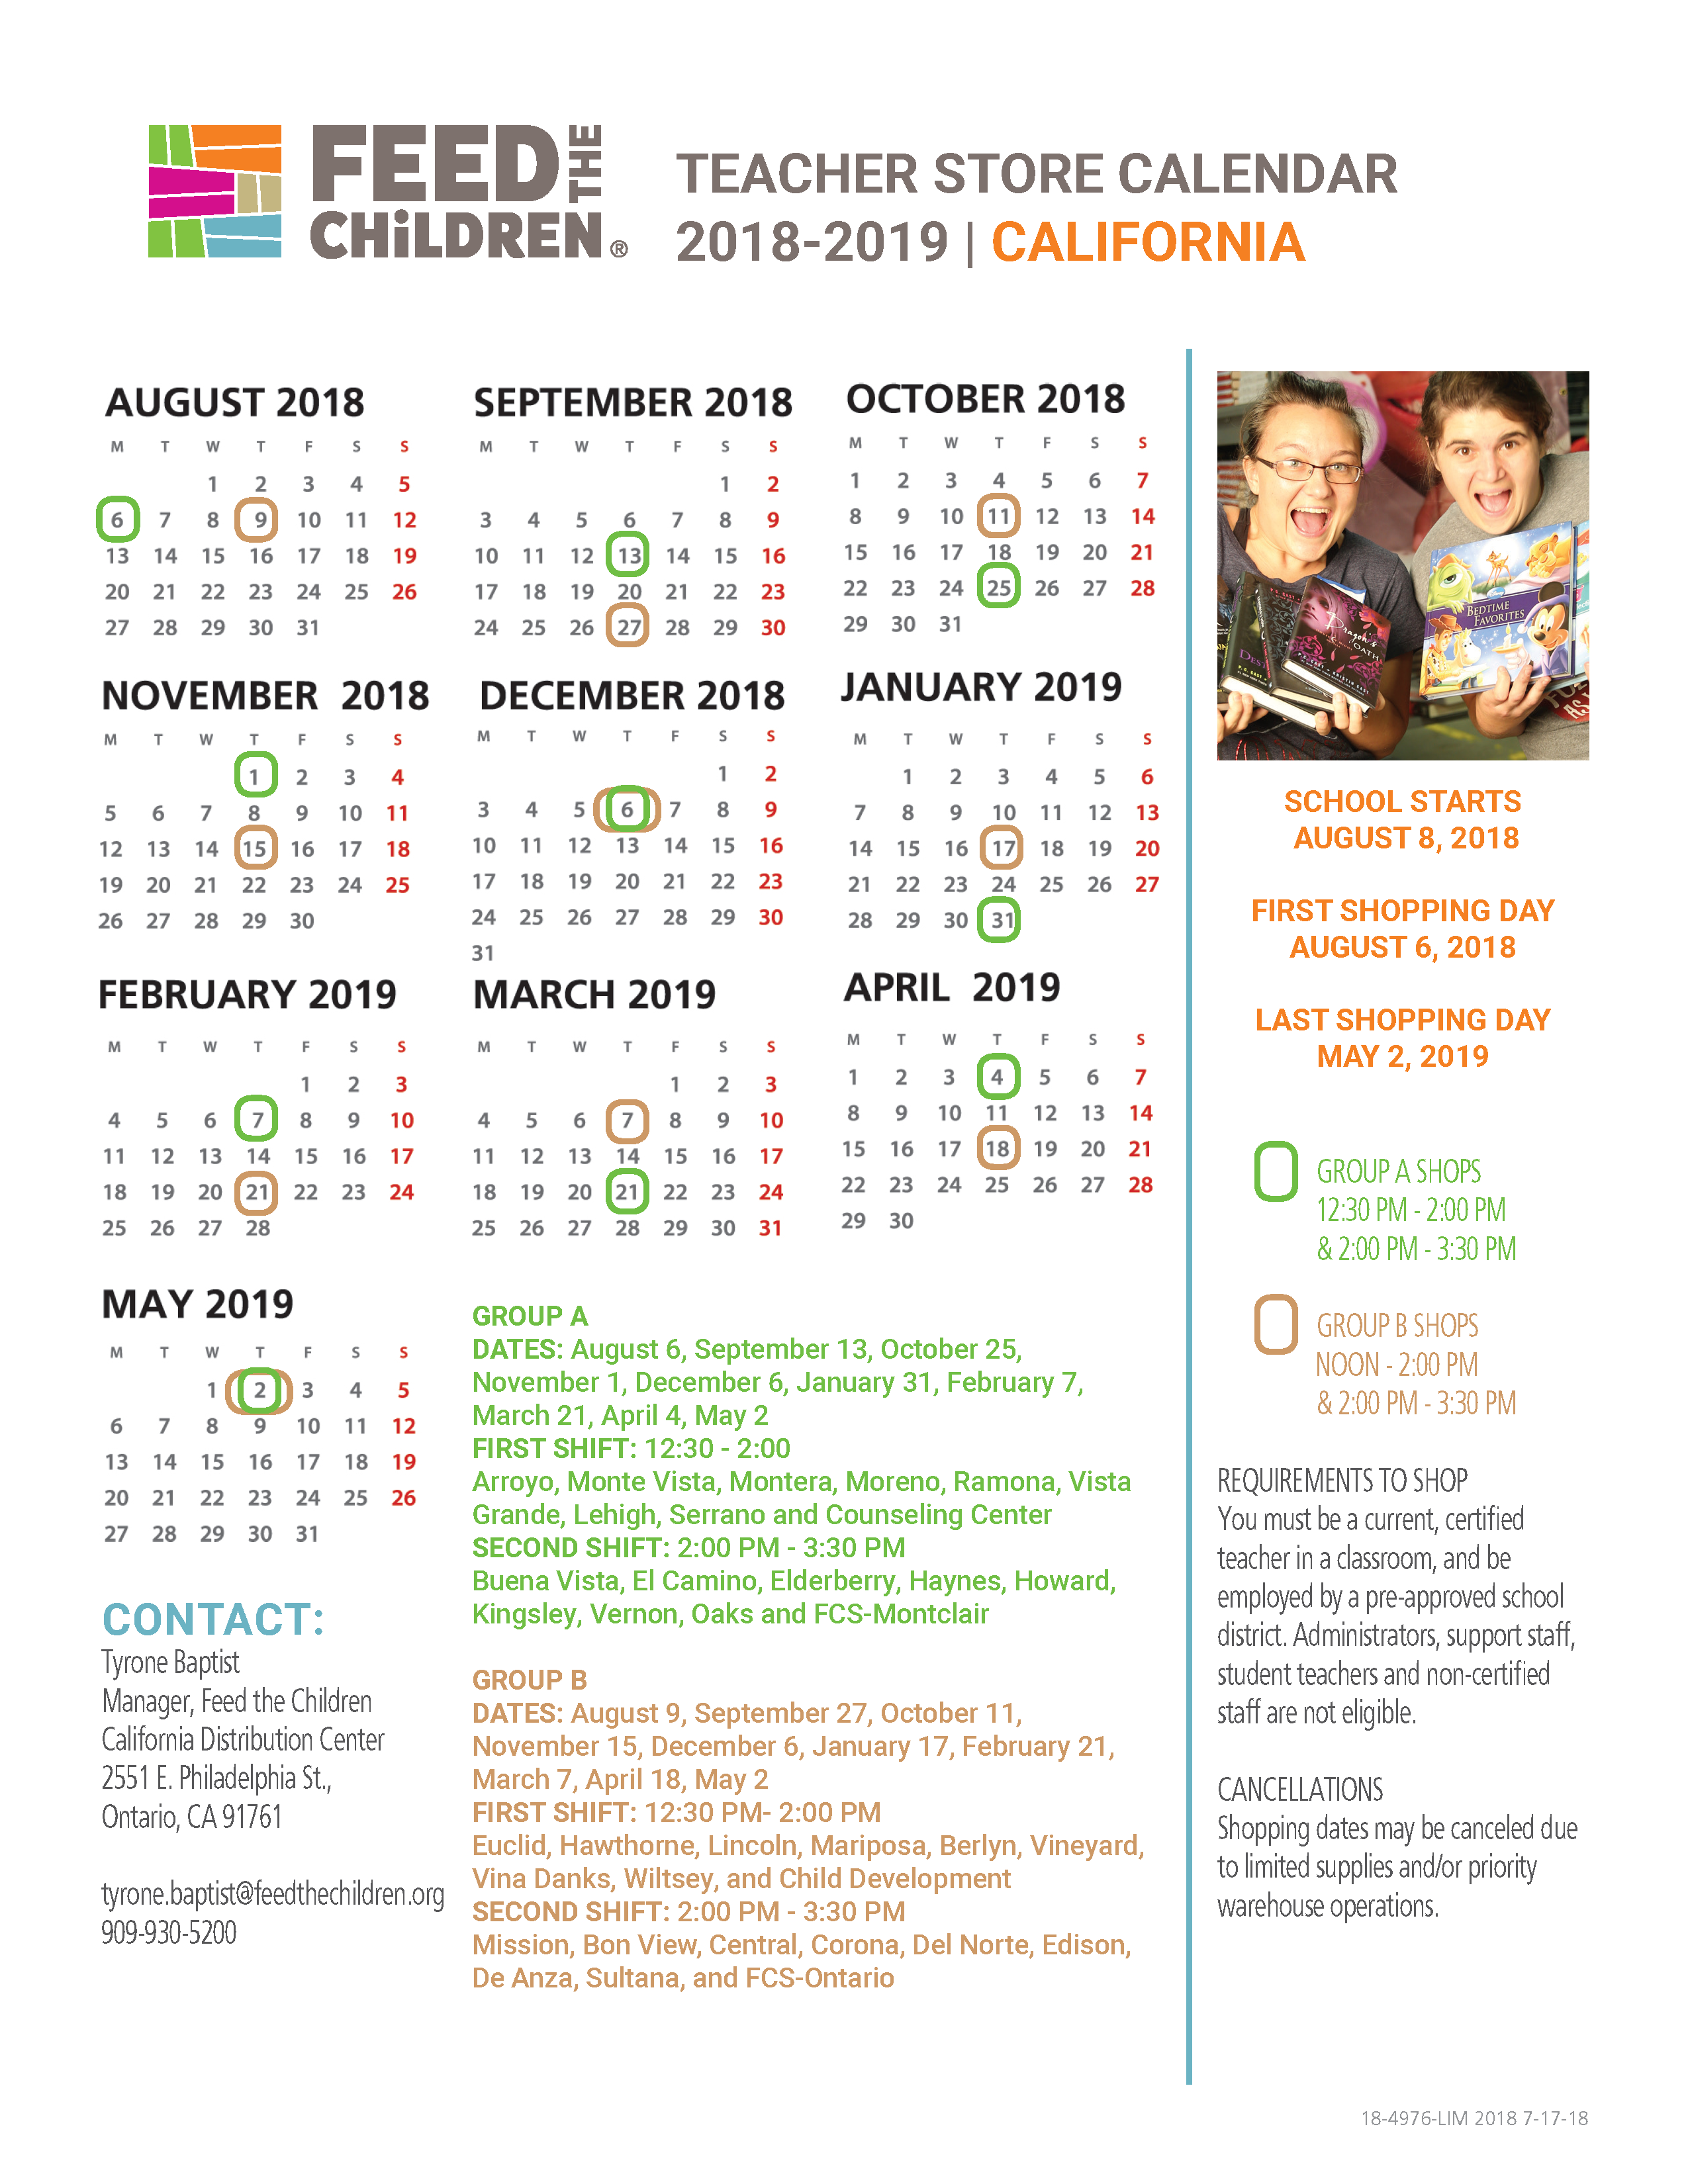 California Teacher Store Calendar